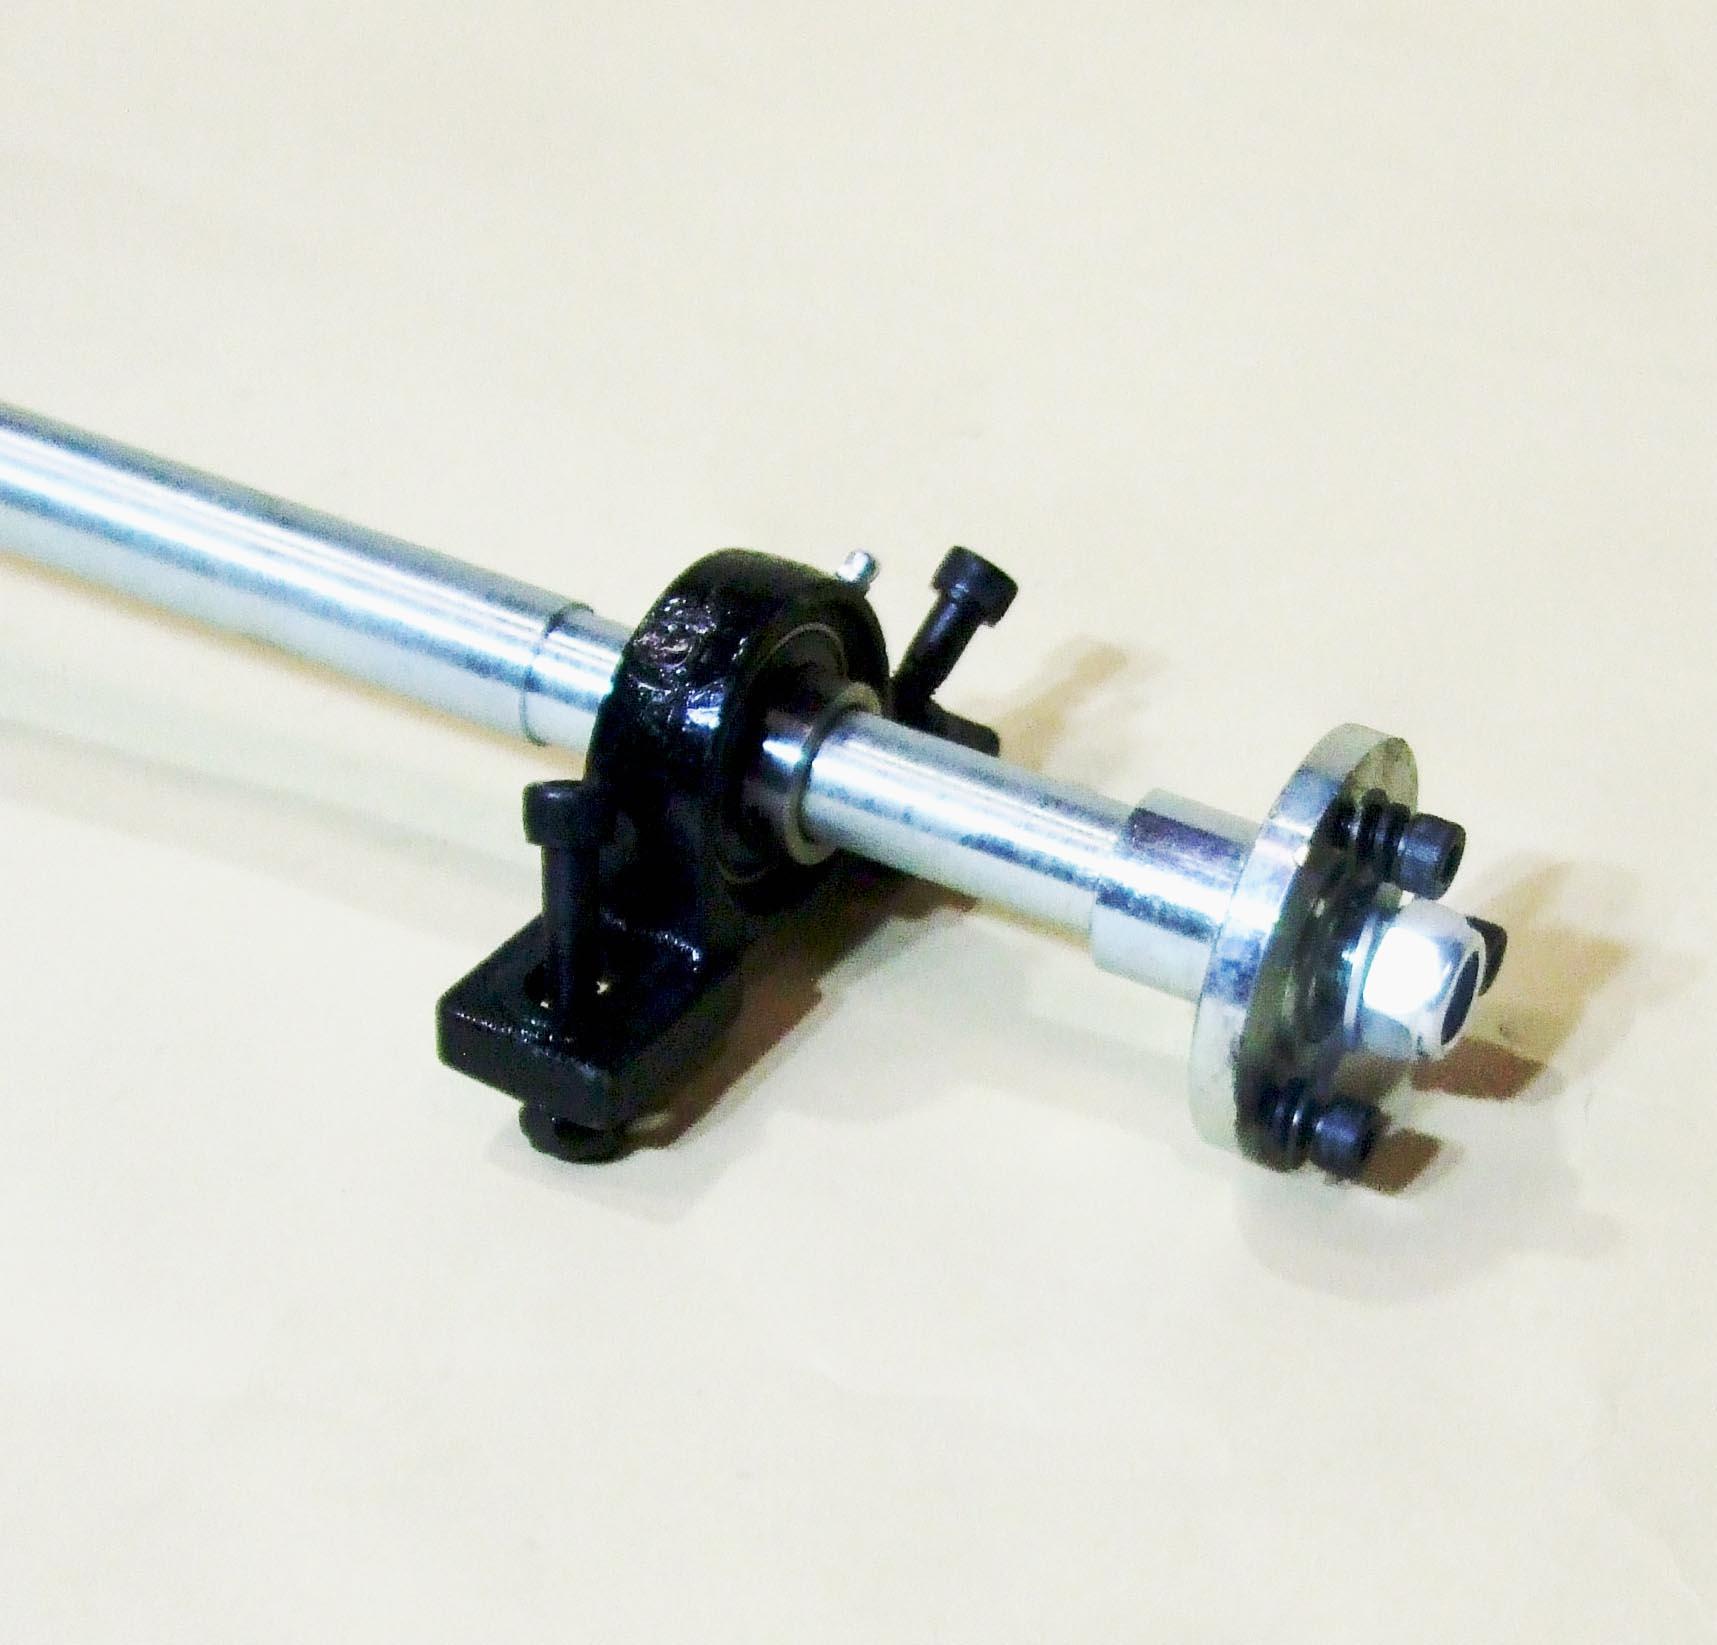 Rear Axle Set 27mm Axle Hubs Rotor Disc Sprocket 420 Pillow Blocks Drift Trike Star Products